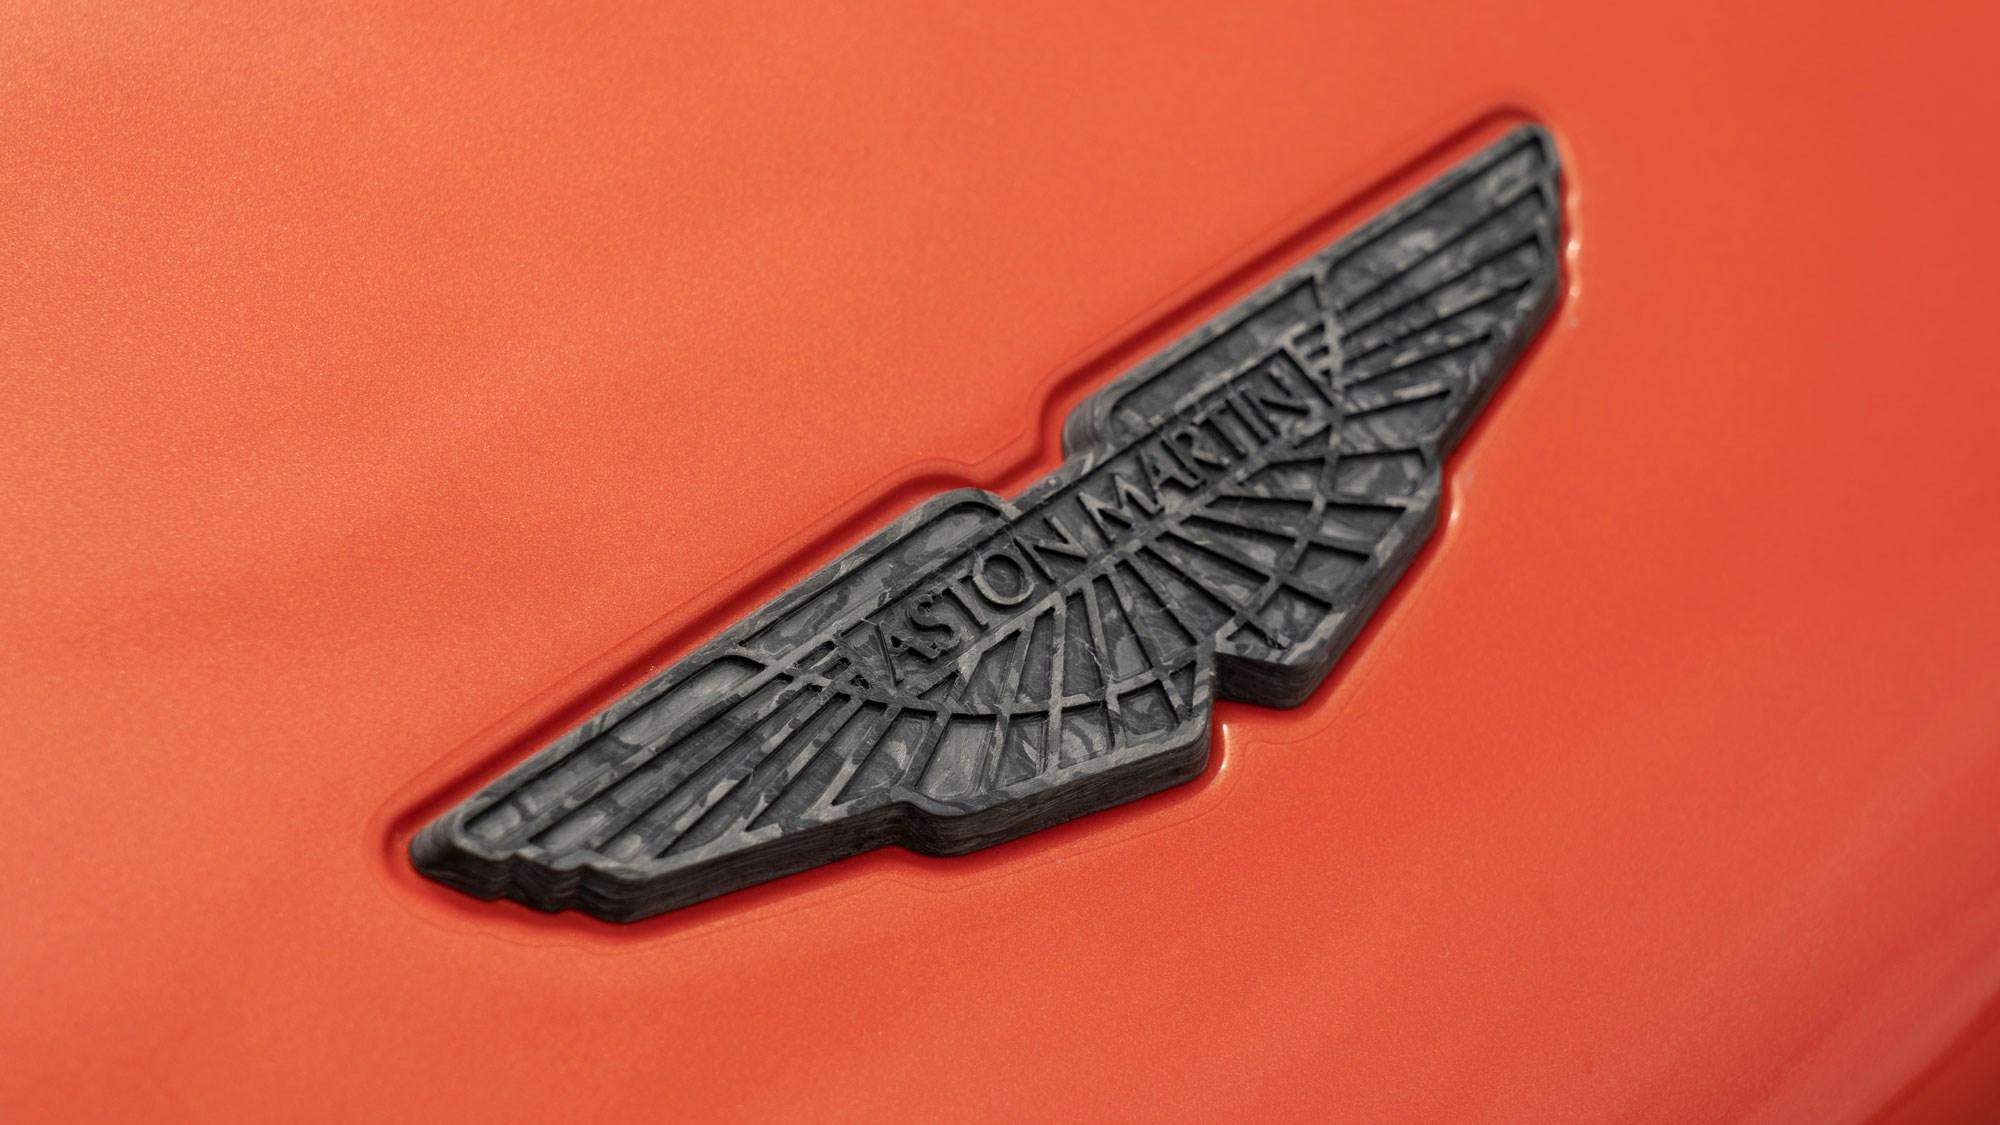 Aston DBS Superleggera badge